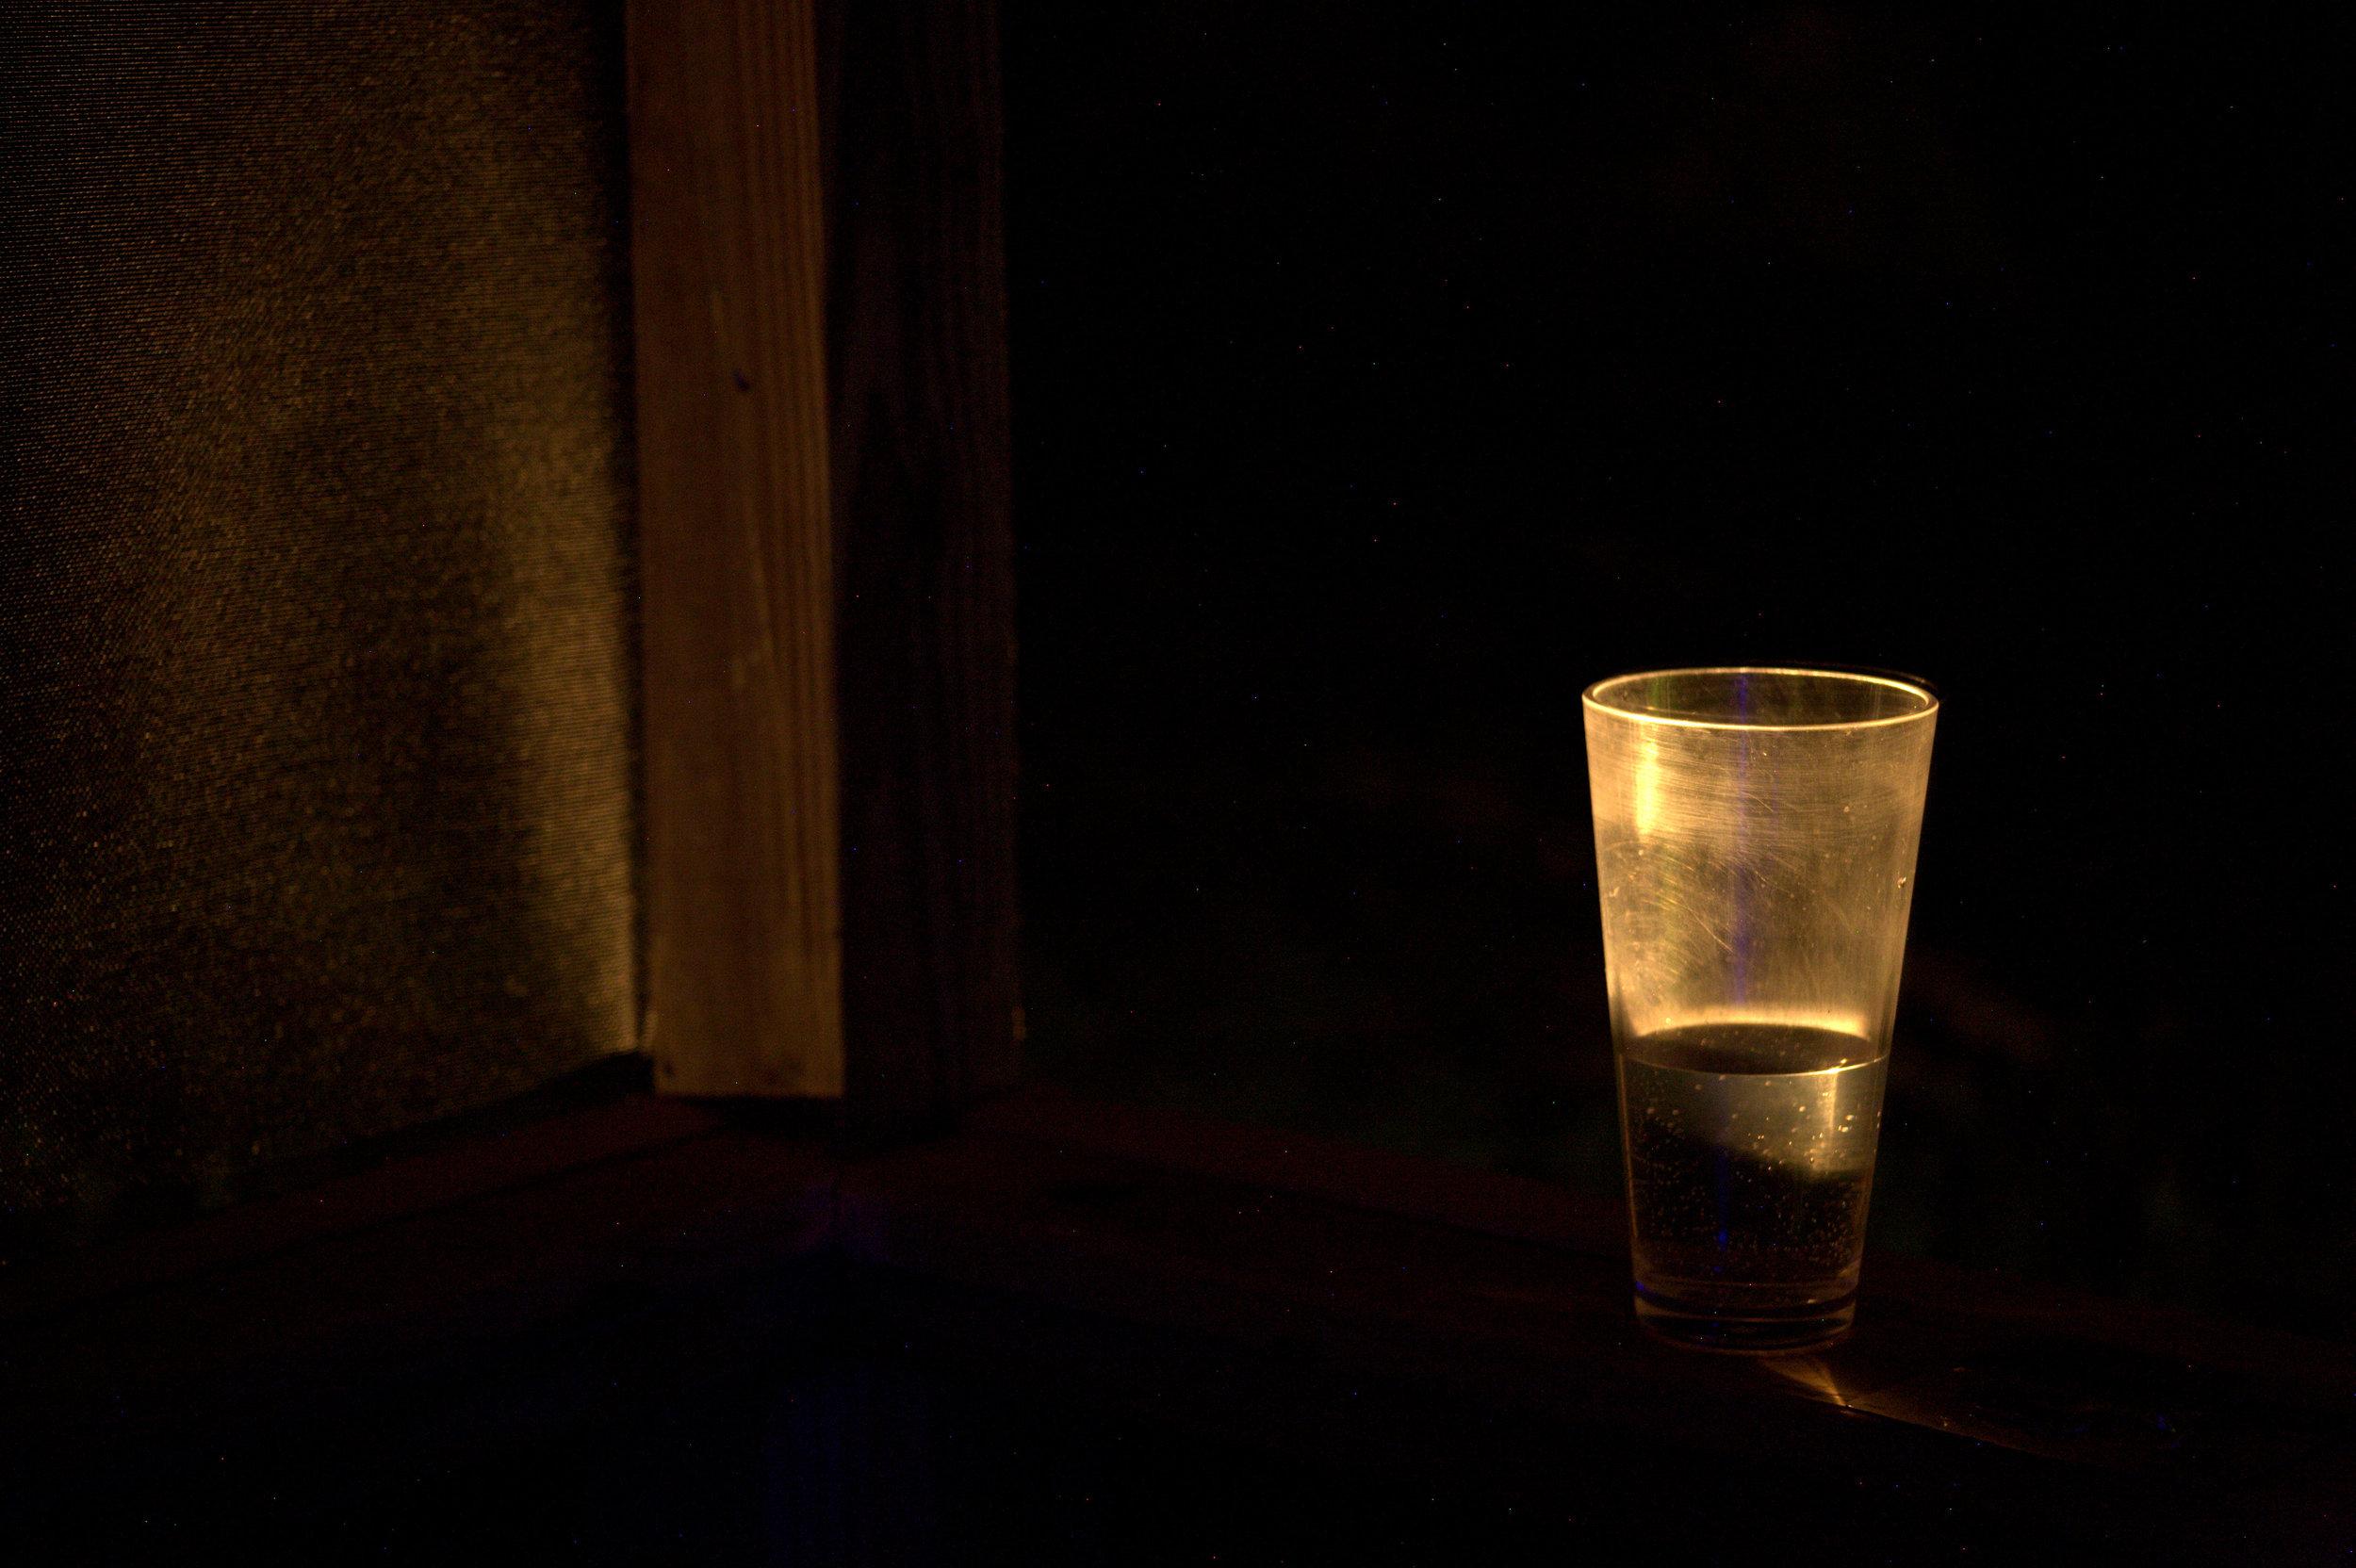 waterglass1.jpg